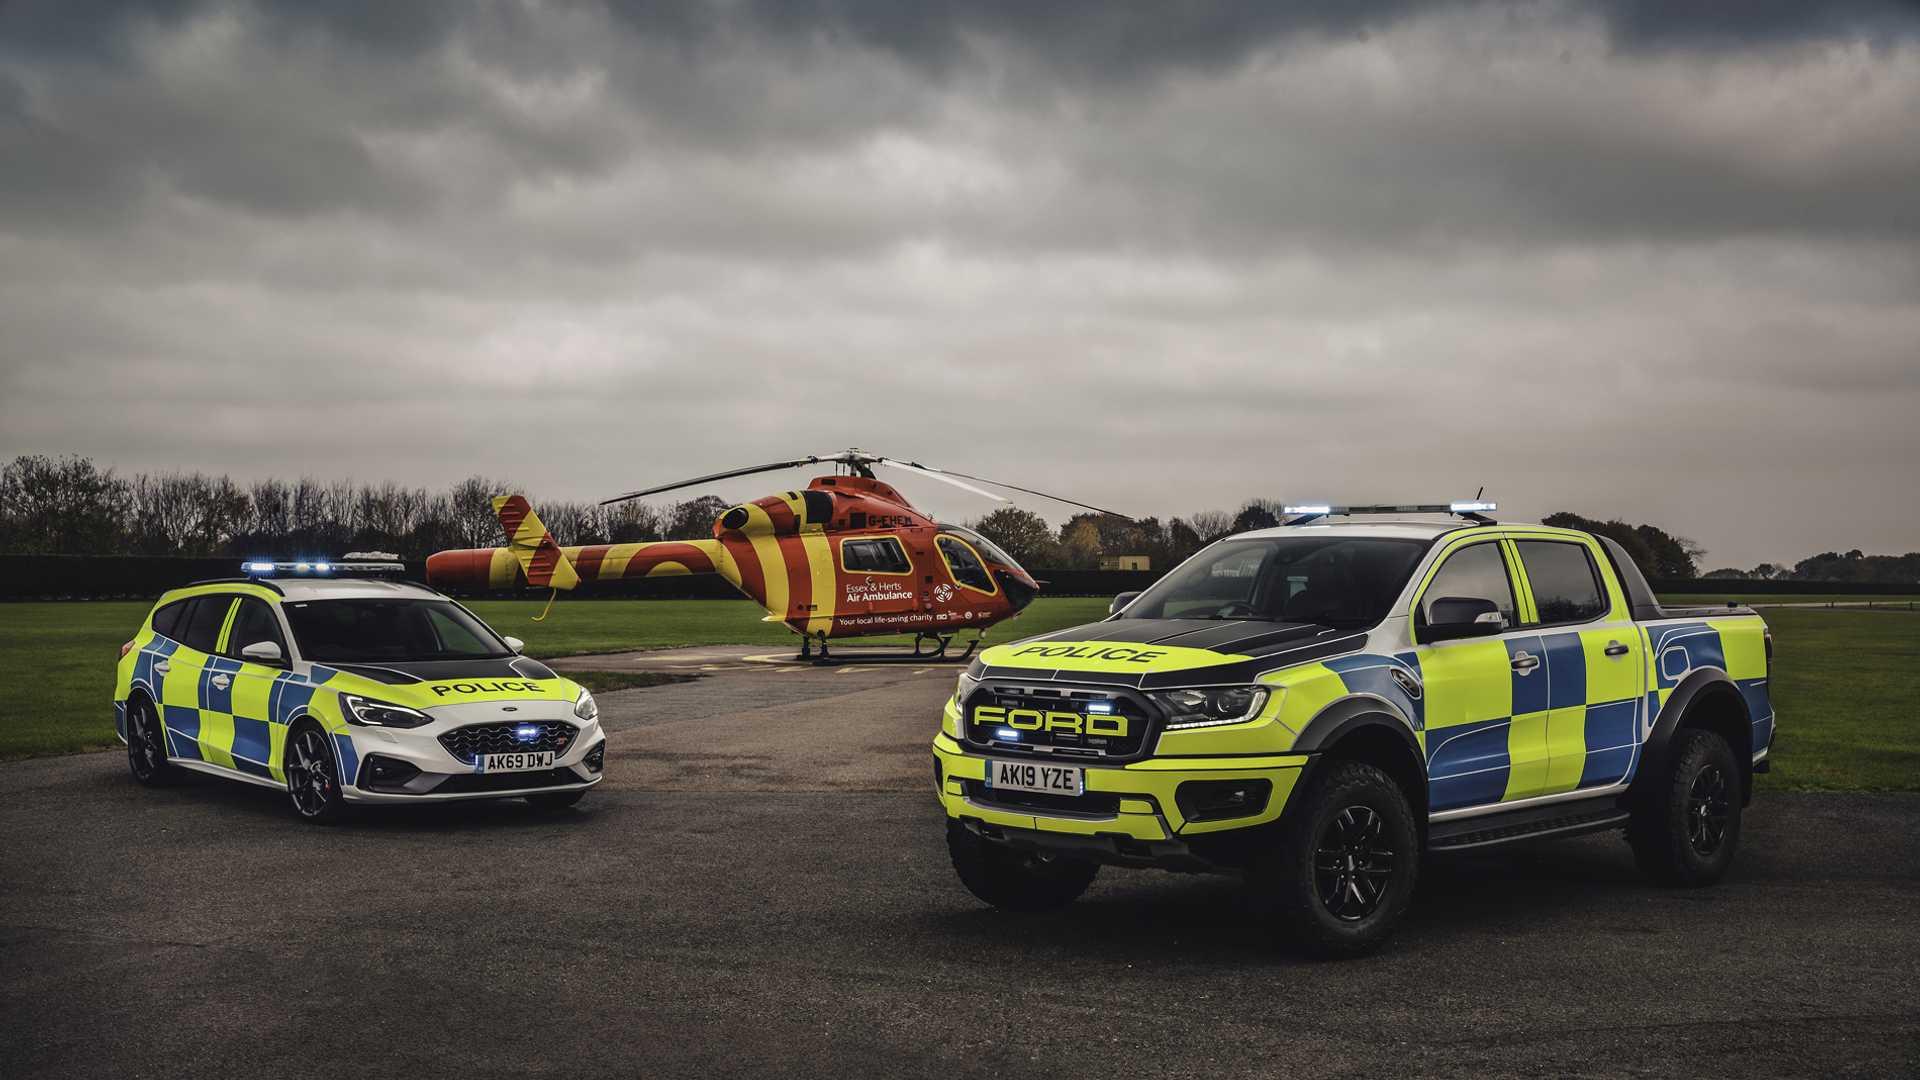 Ford-Focus-ST-and-Ranger-Raptor-UK-police-cars-5